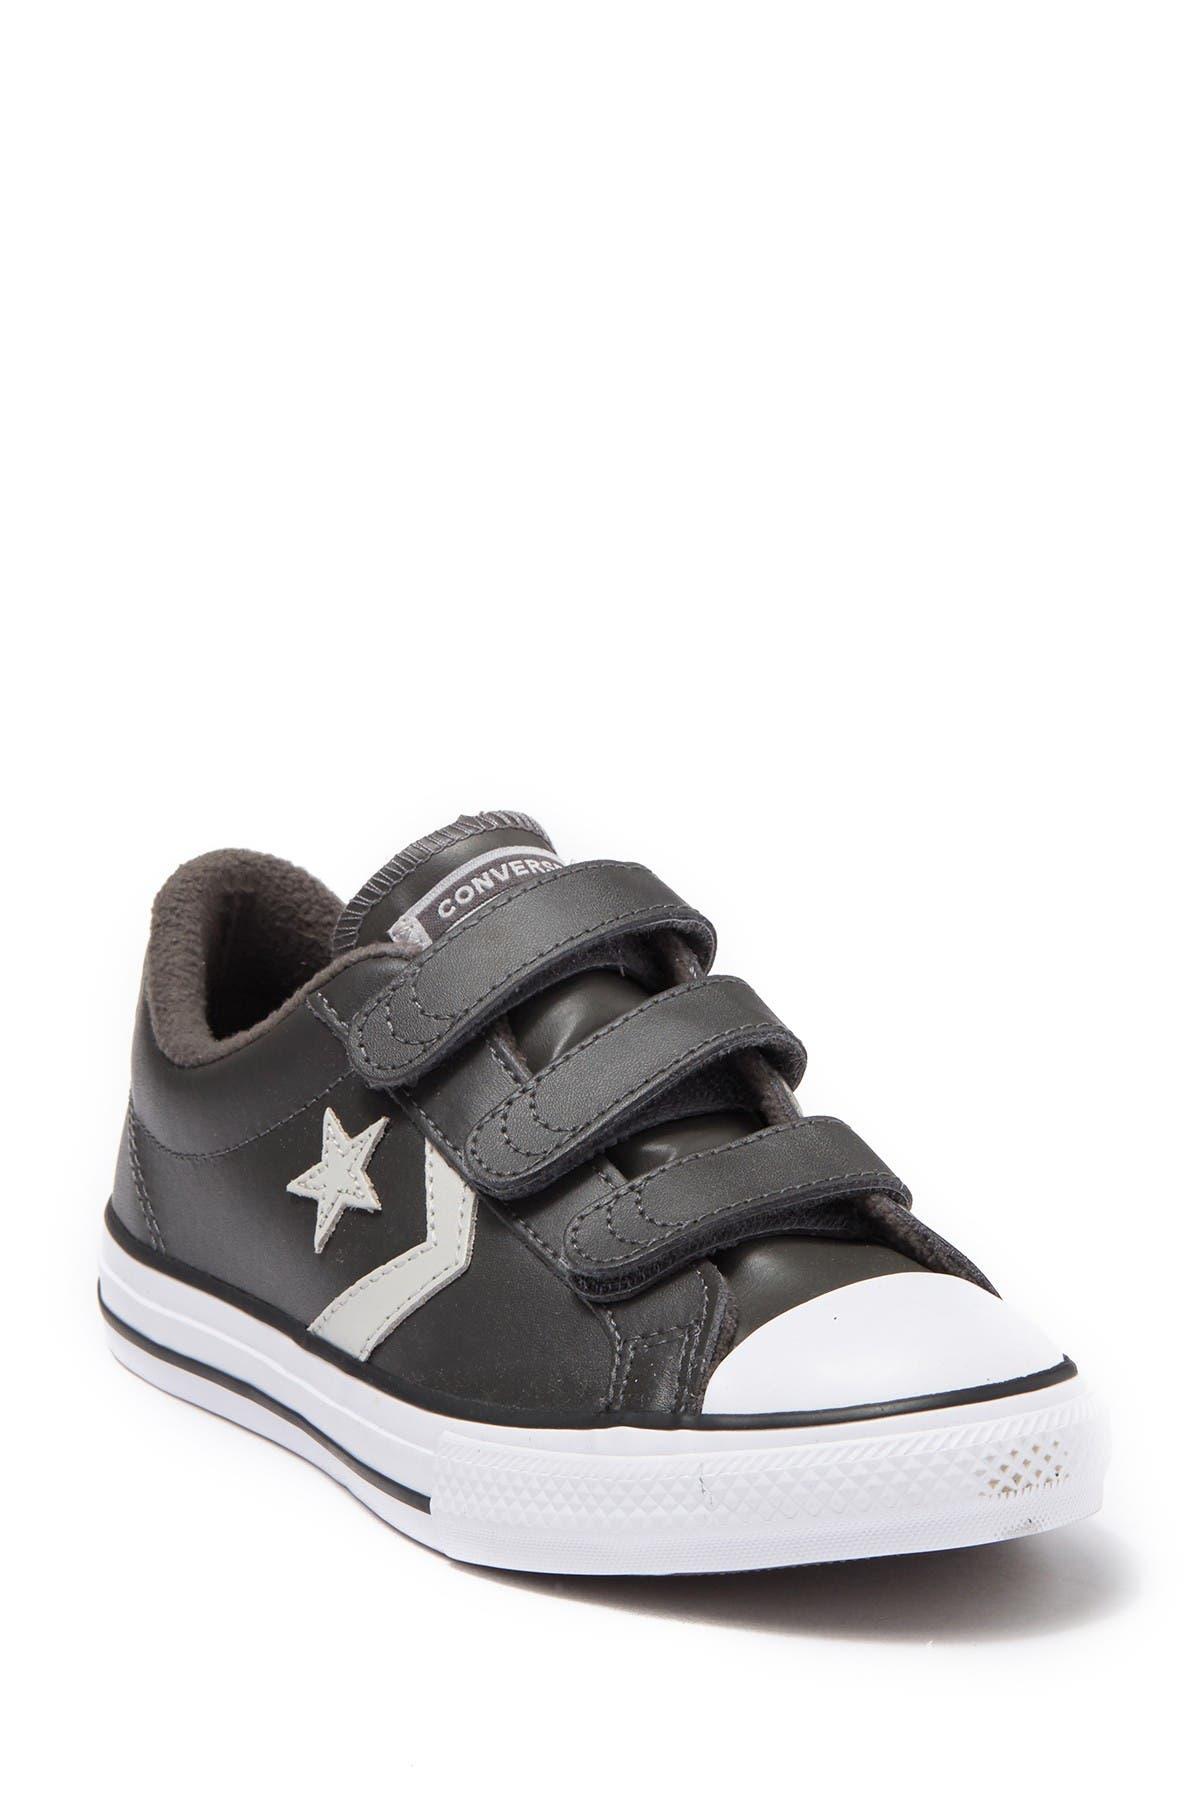 Converse   Star Player 3V Oxford